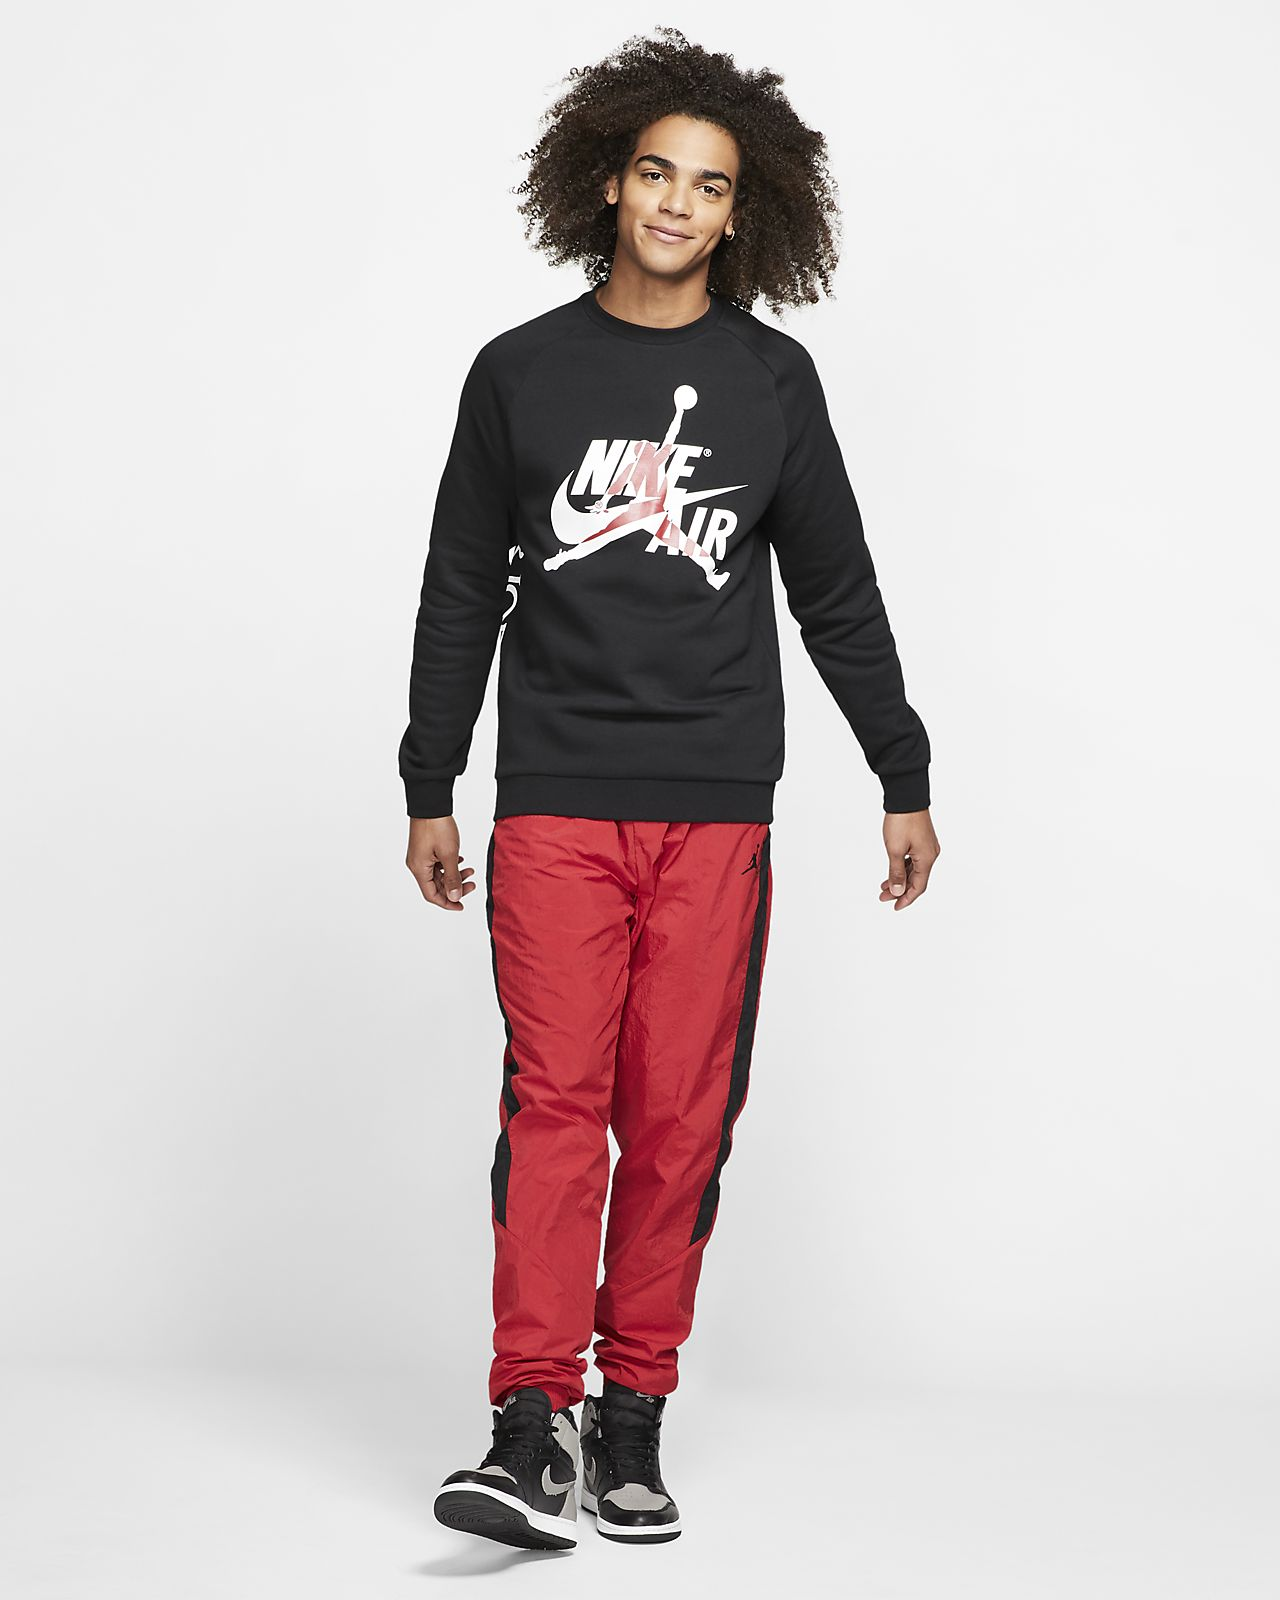 a44216323add51 Jordan Jumpman Classics Herren-Rundhalsshirt. Nike.com AT